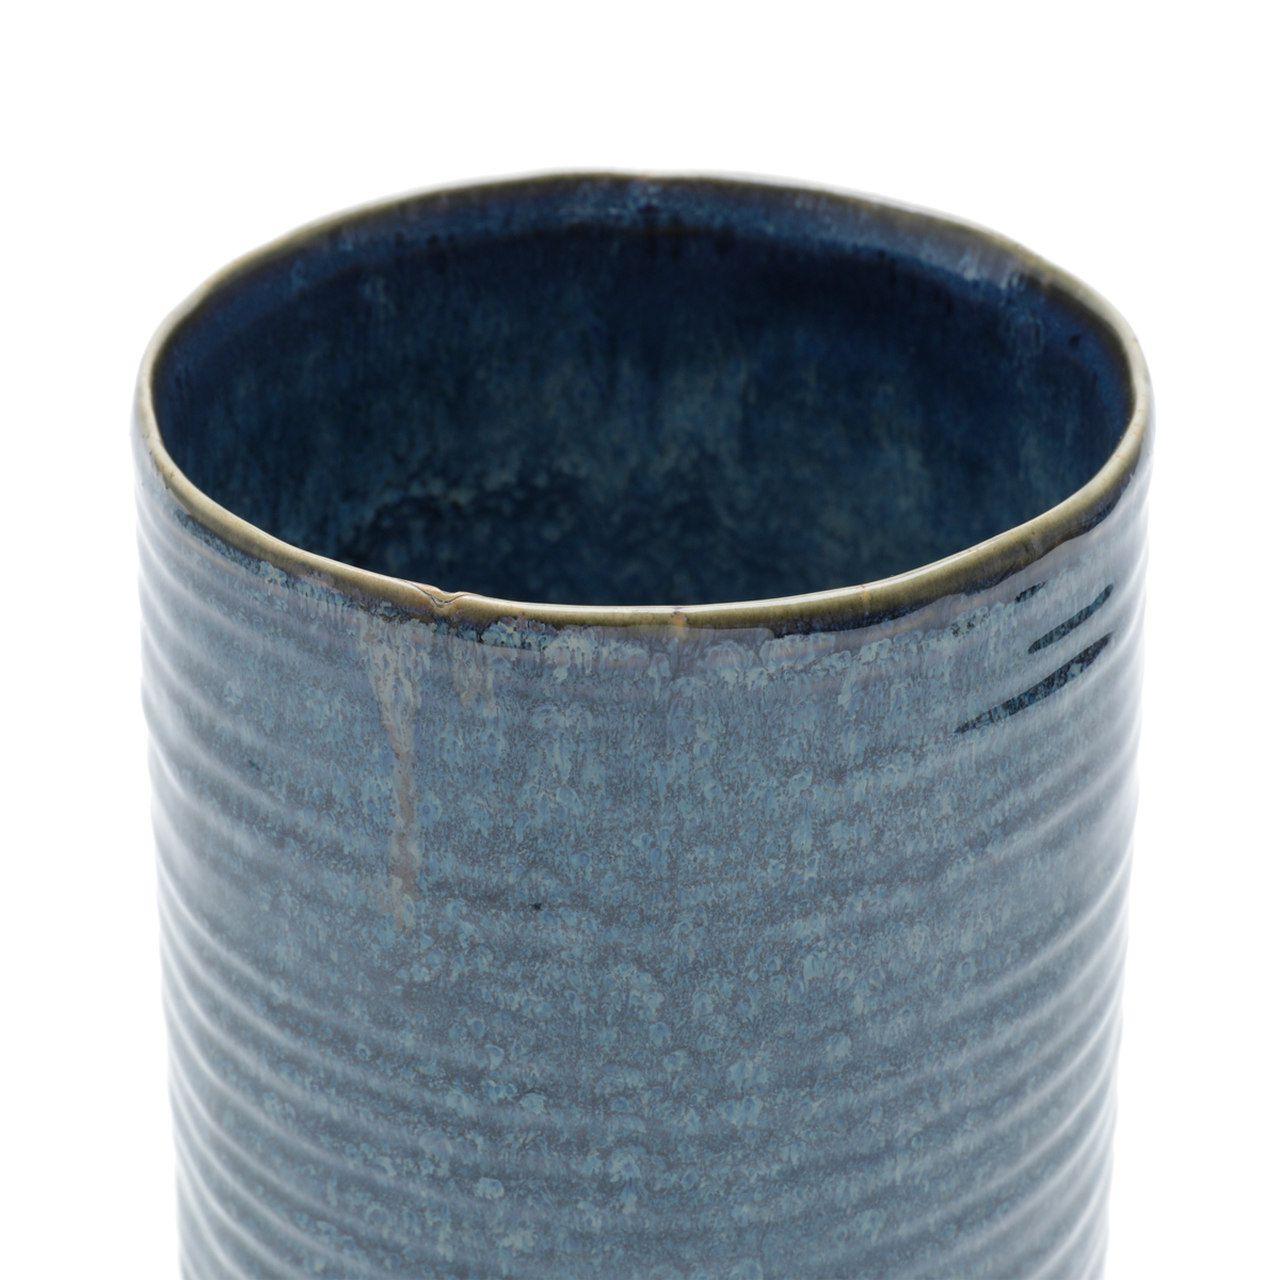 Vaso Decorativo Cerâmica Azul 14x29hcm